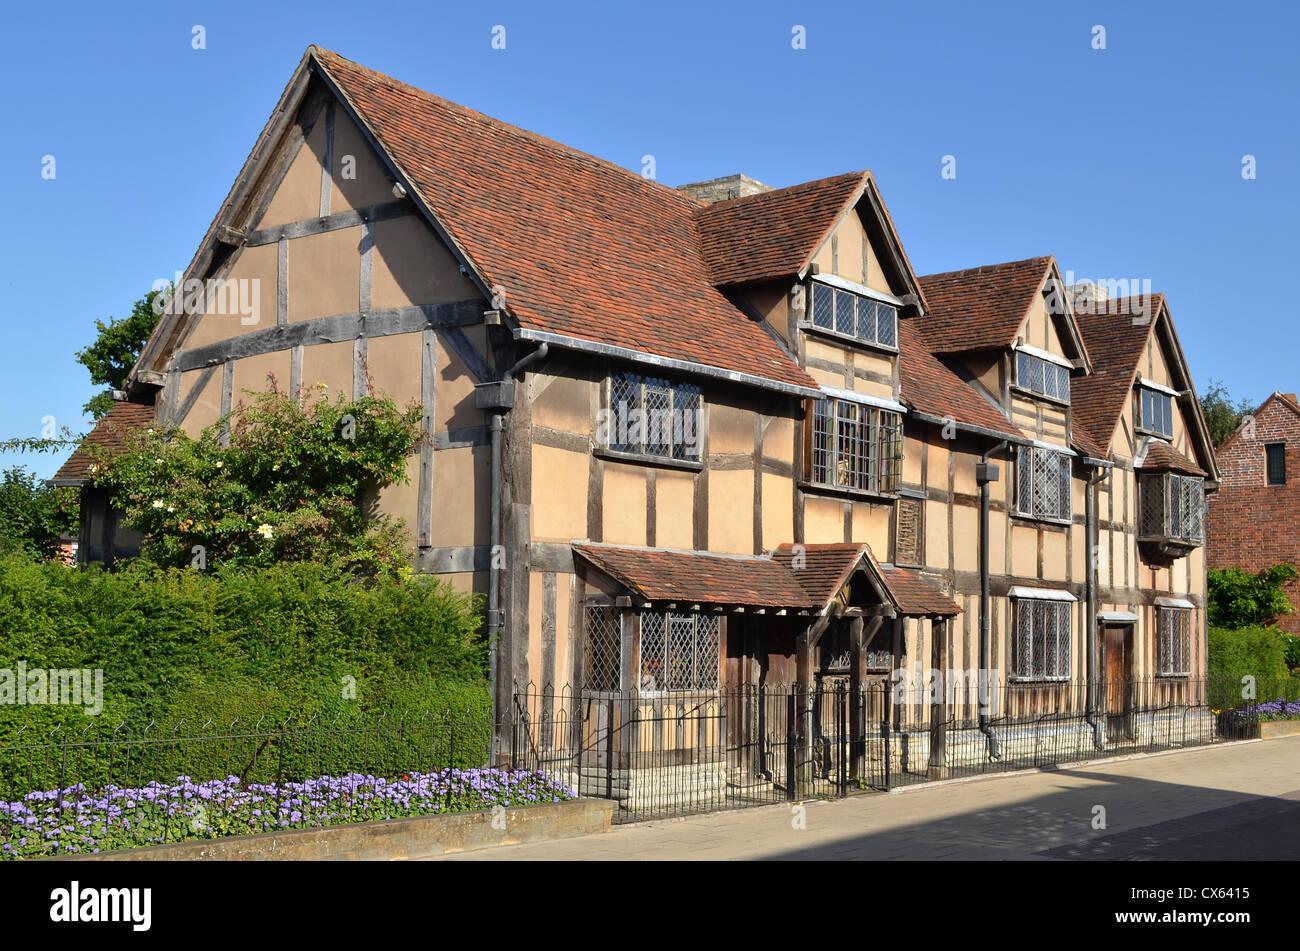 Shakespeare's Birthplace, Stratford-upon-Avon, Warwickshire, UK - Stock Image